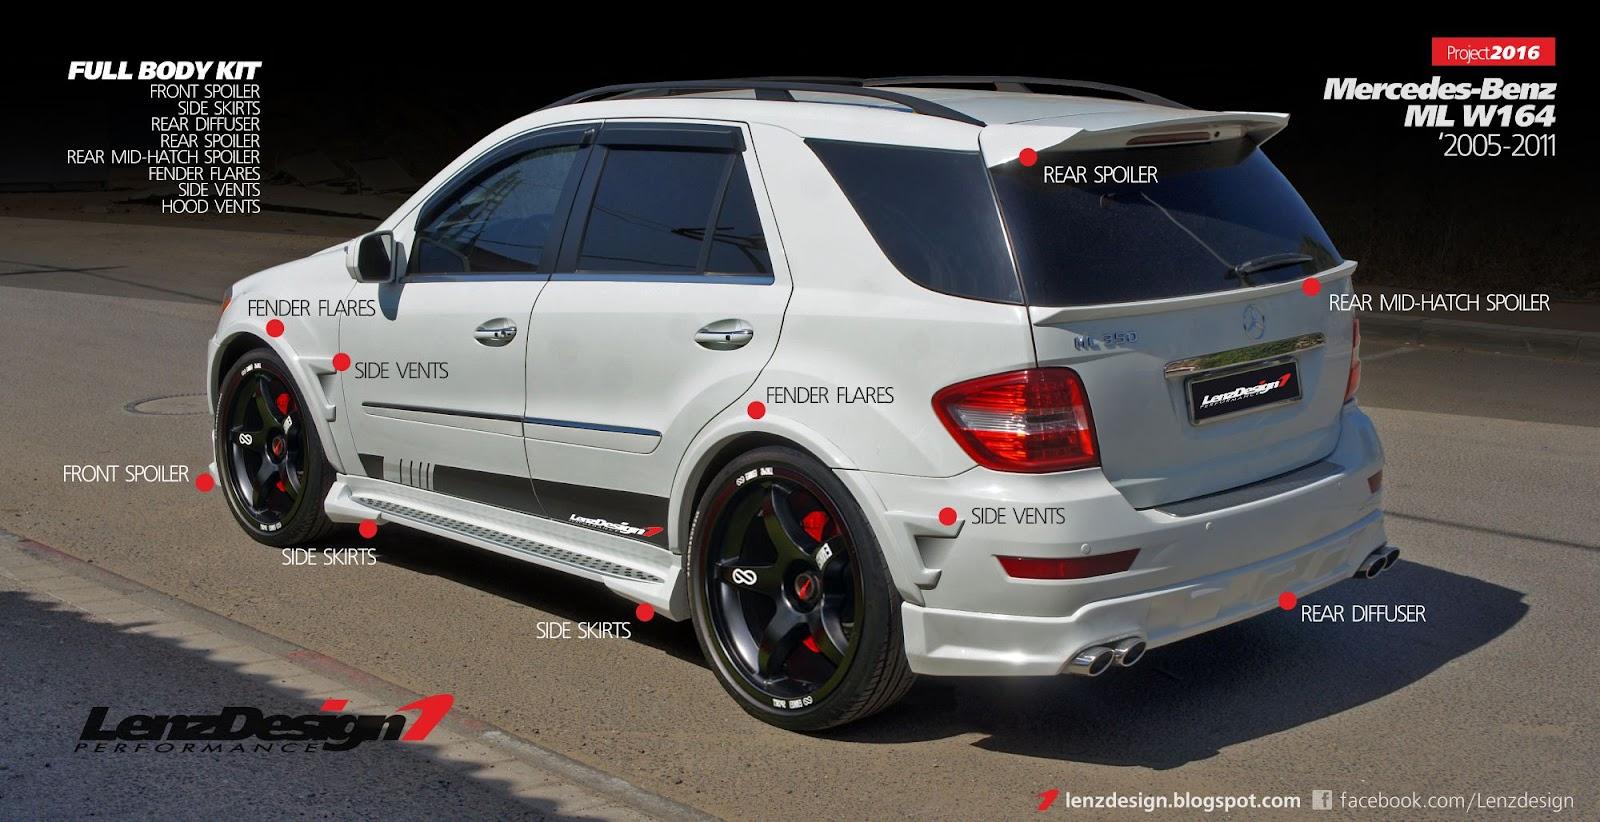 Mercedes Benz Ml W164 Lenzdesign Bodykit Amp Spoilers